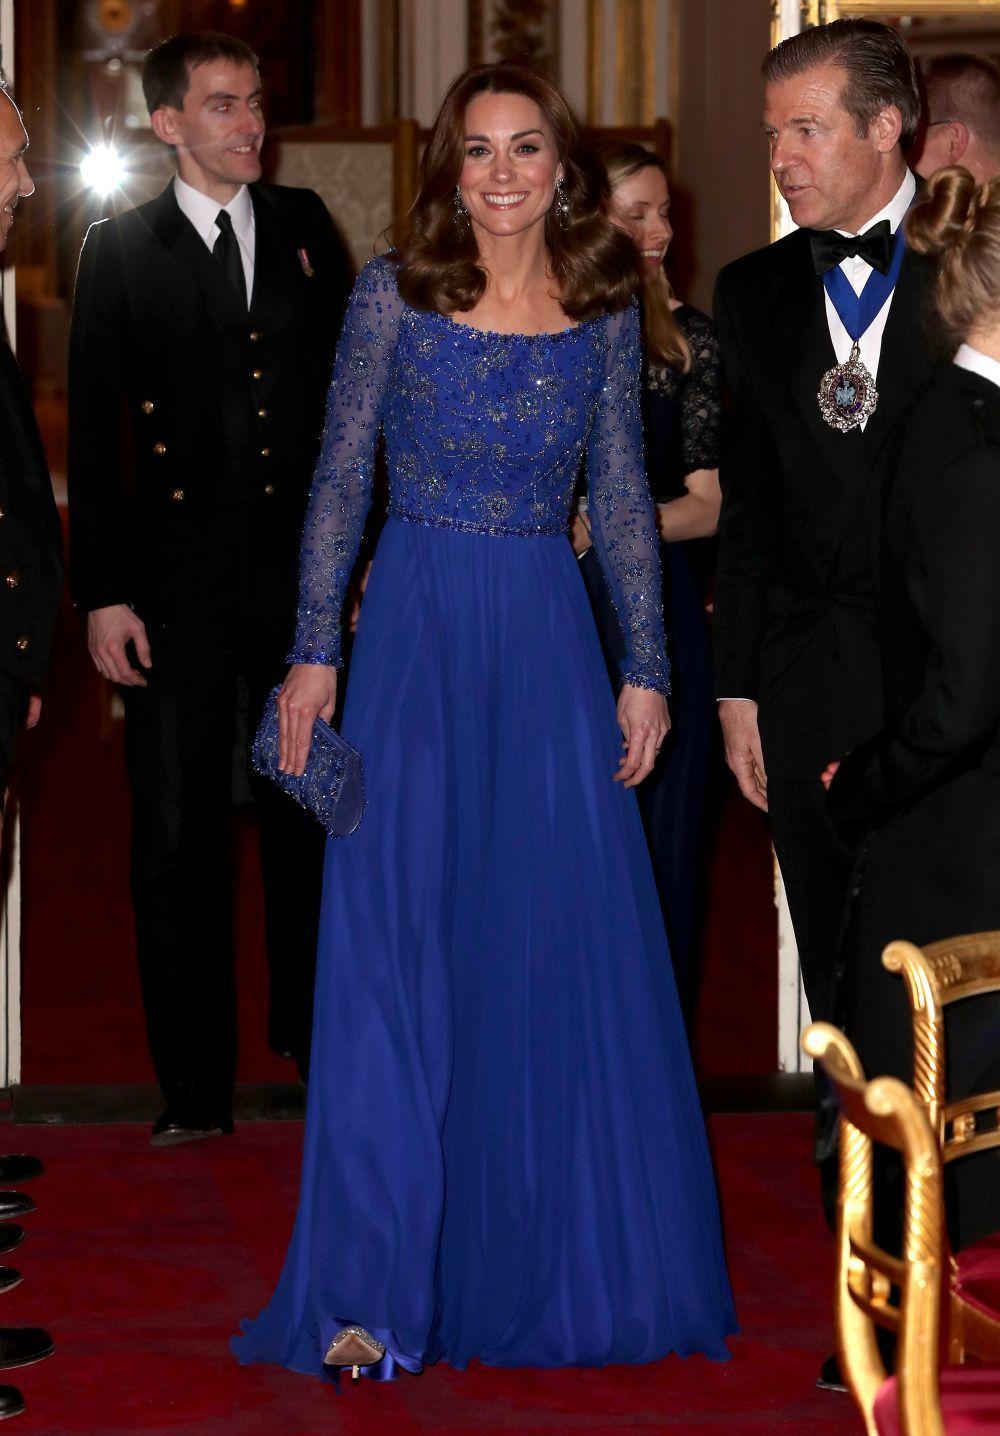 La duquesa de Cambridge con un vestido azul de Jenny Packham.